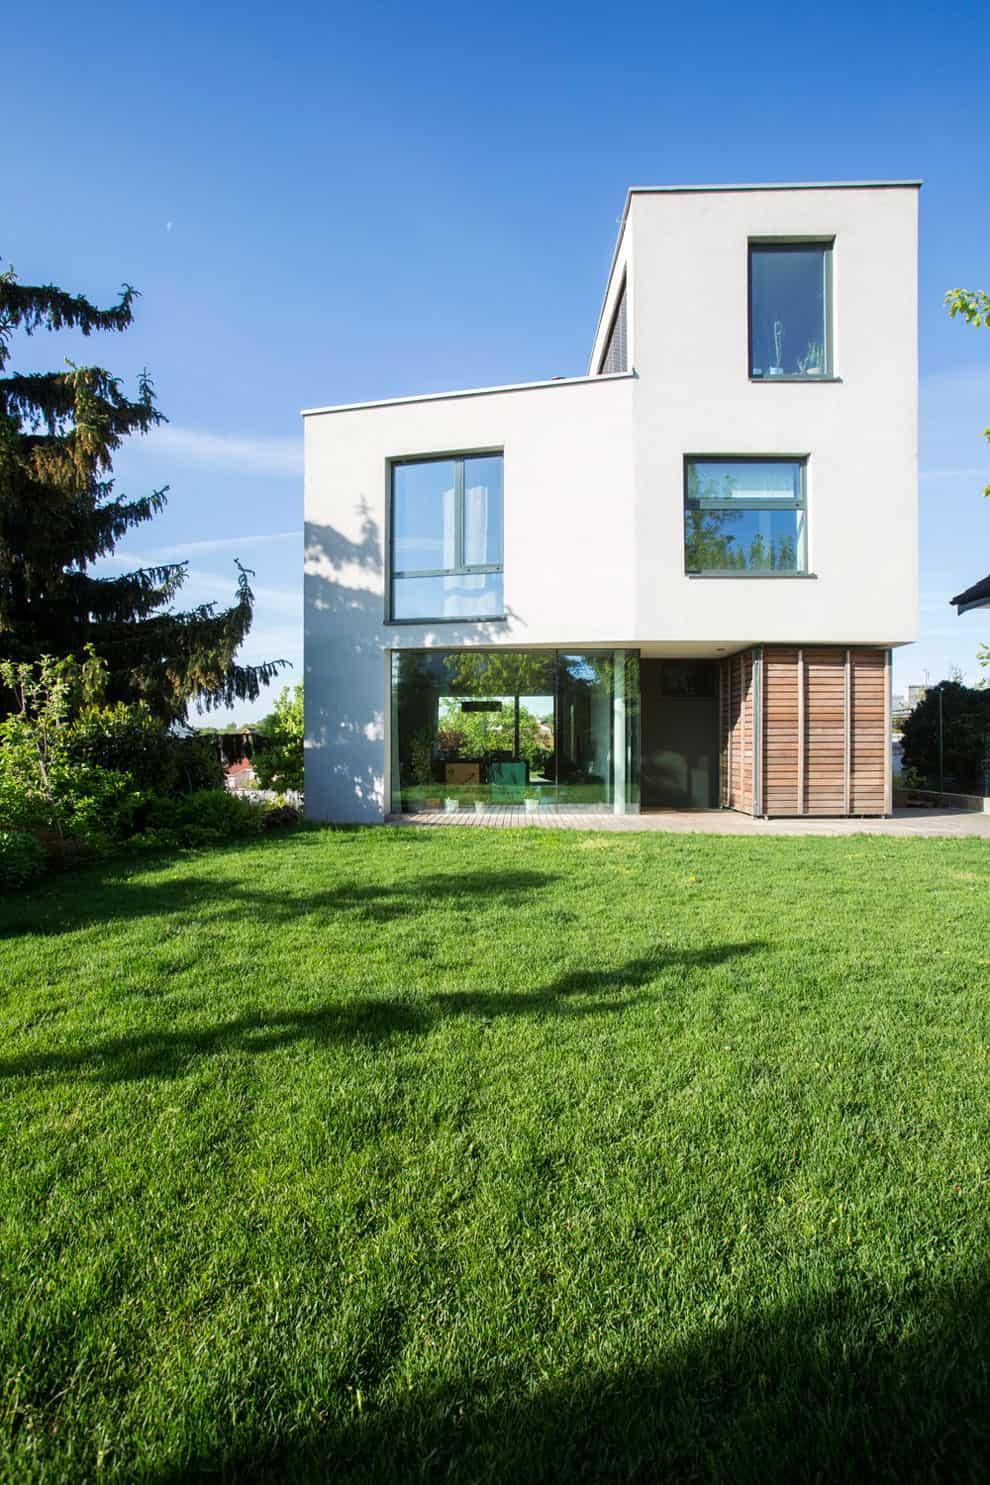 Double View House by Architekti Šebo Lichý (4)